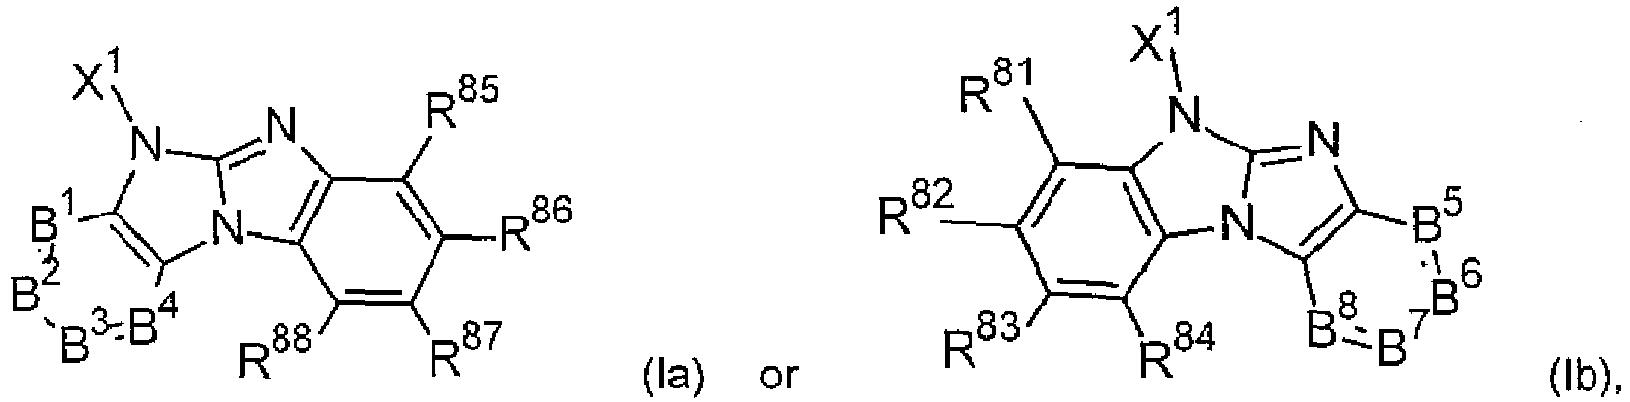 Figure imgb0734